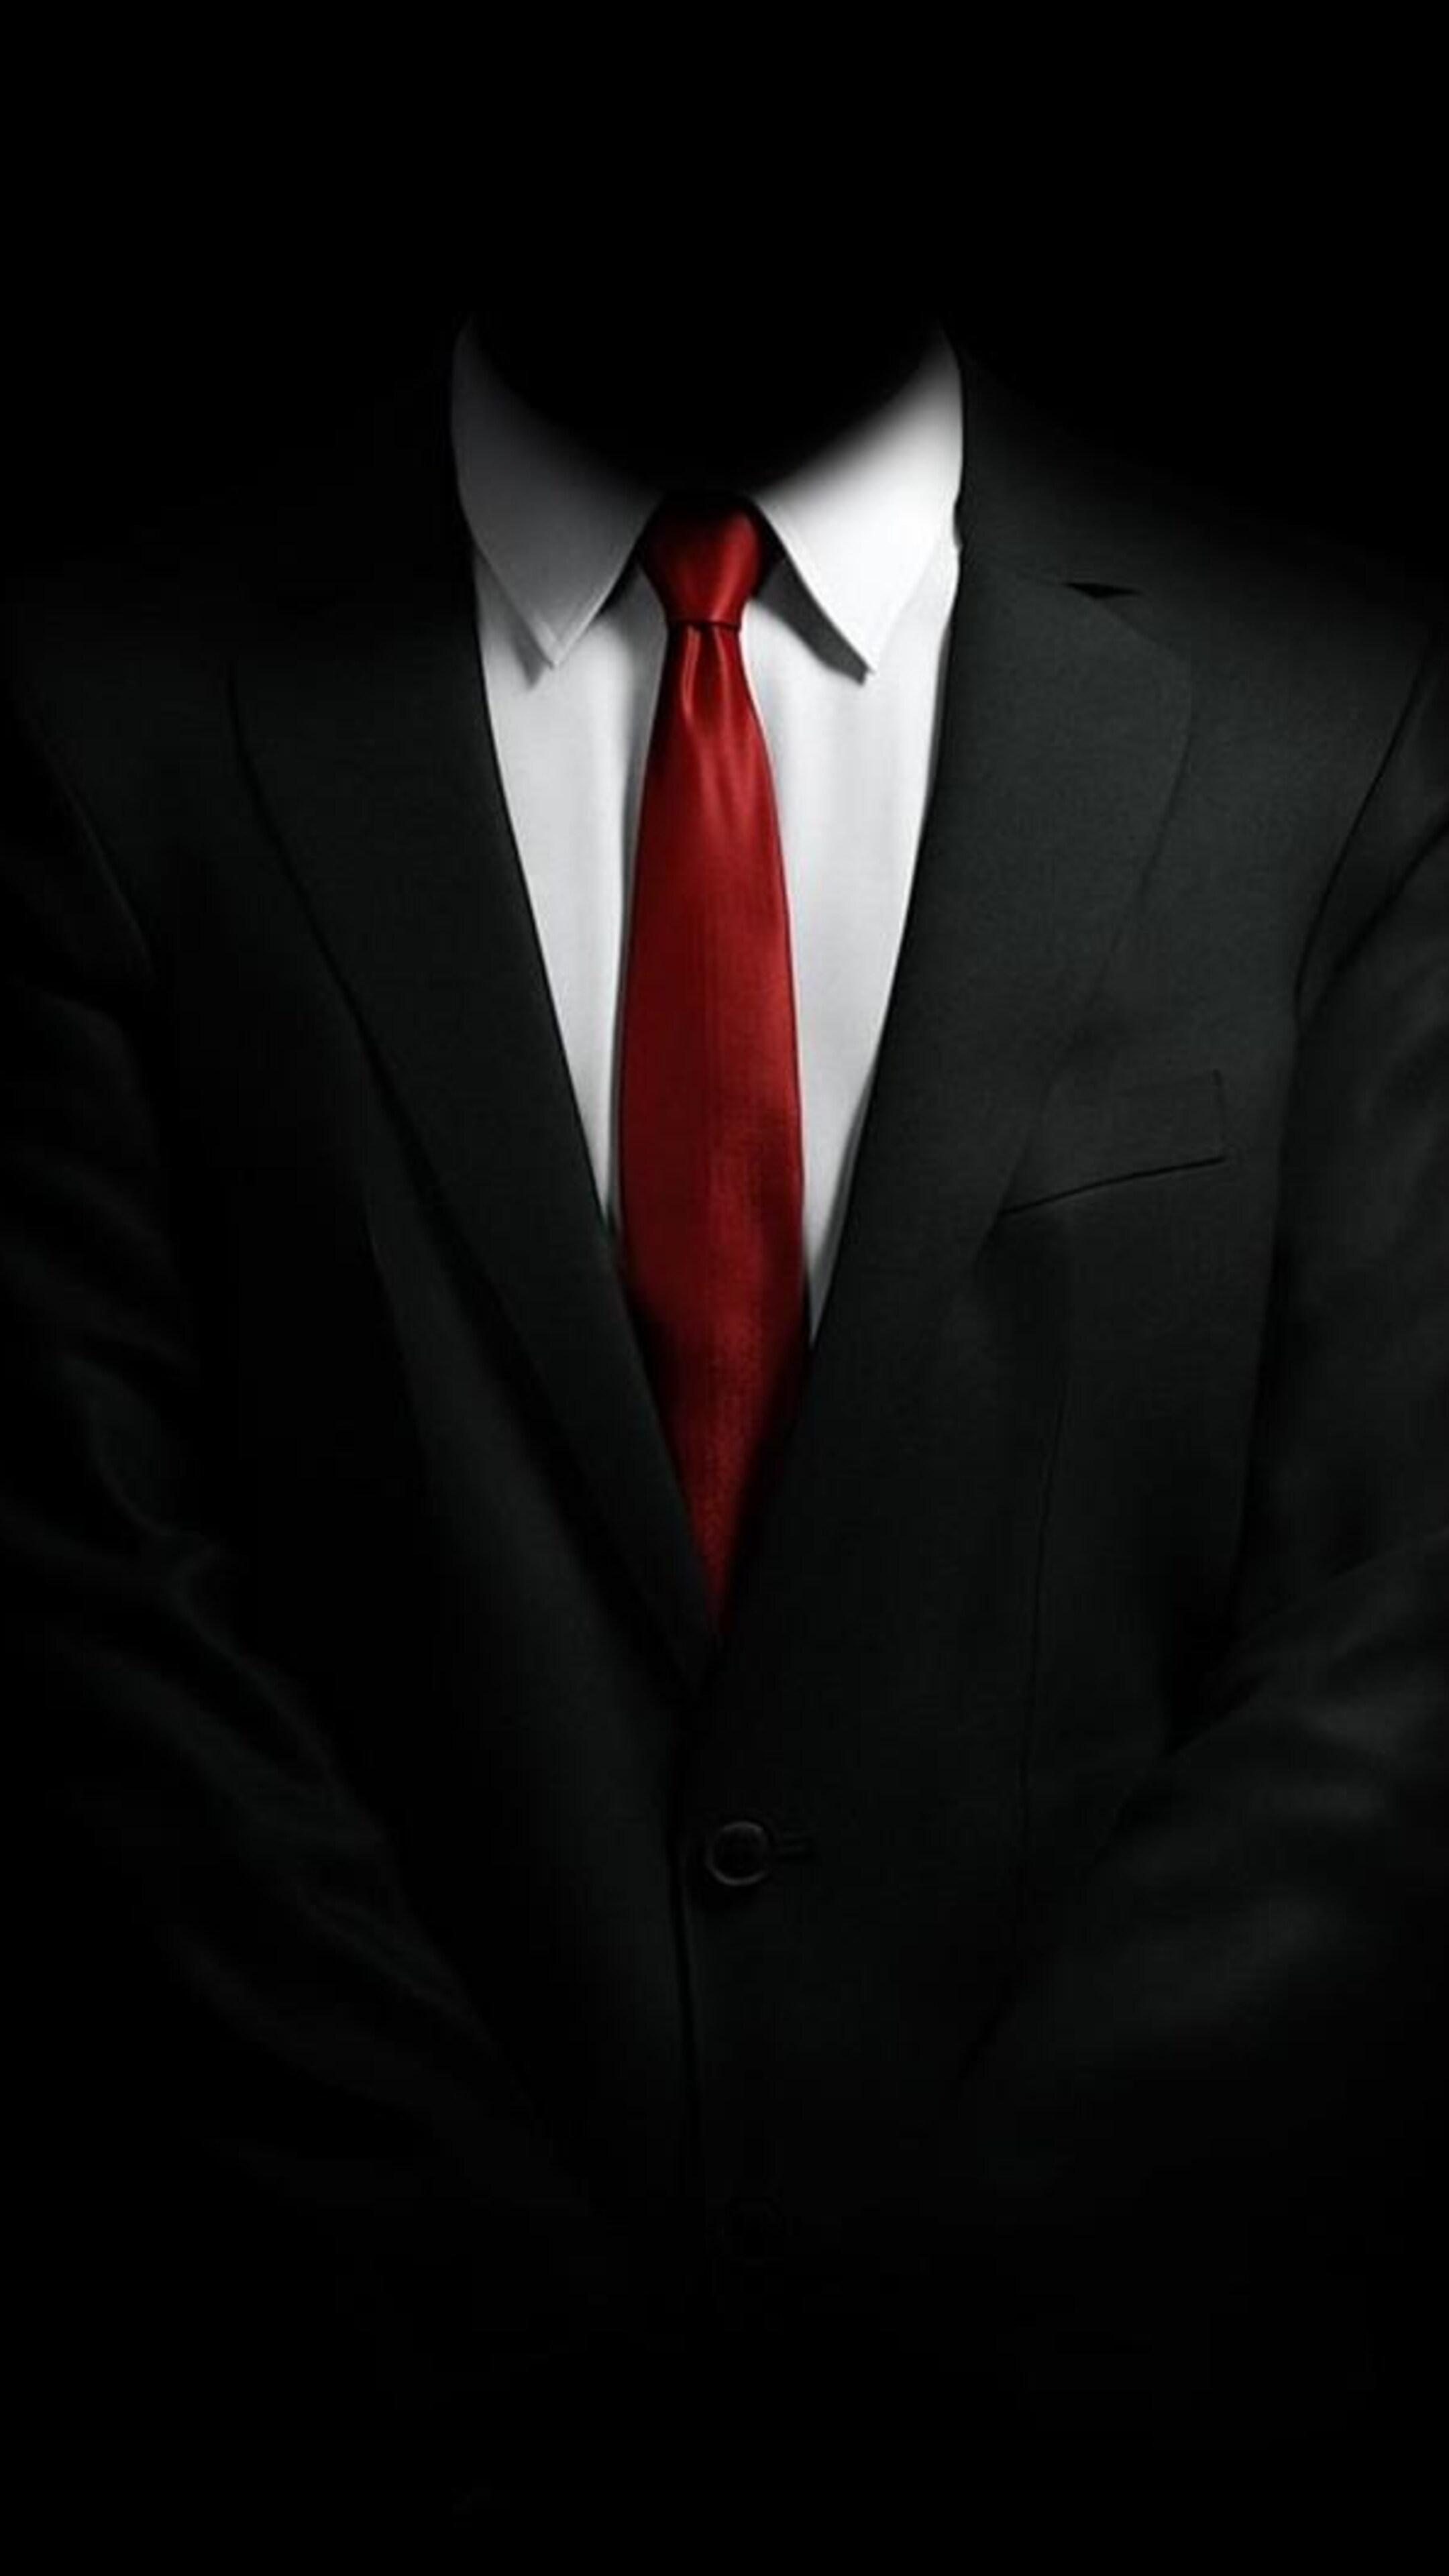 2160x3840 hitman agent 47 suit sony xperia x xz z5 premium hd 4k wallpapers images backgrounds - Hitman 47 wallpaper ...